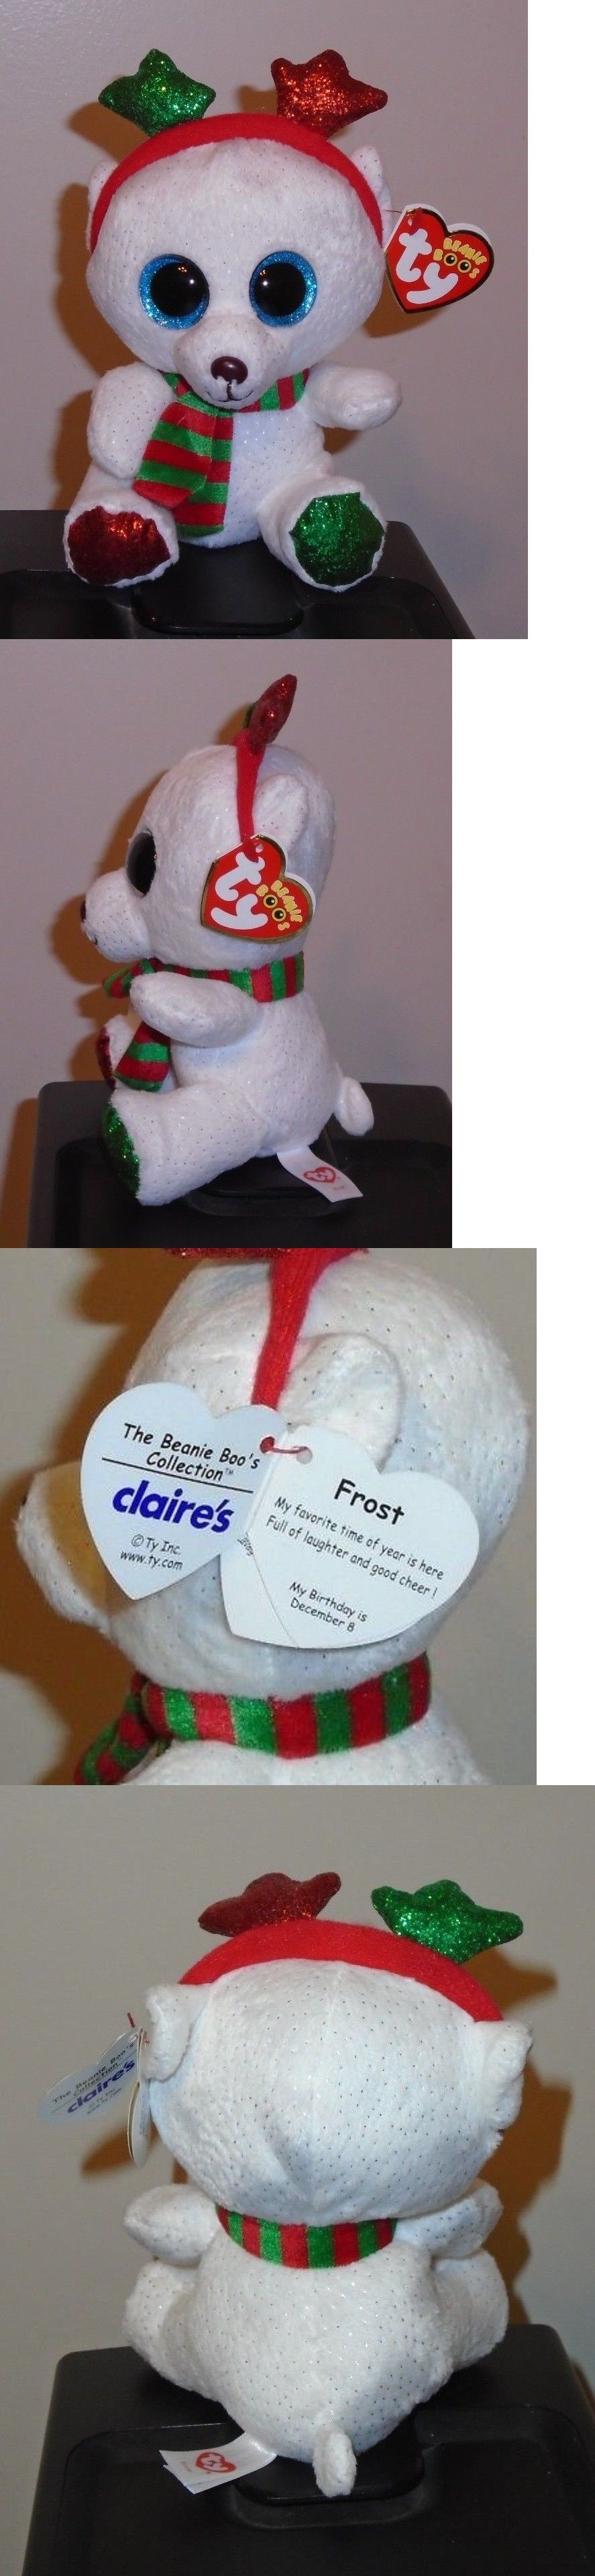 Beanbag Plush 49019  Ty Beanie Boos - Frost The Christmas Polar Bear 6 (2018  Exclusive) New Mwmt -  BUY IT NOW ONLY   14.9 on  eBay  beanbag  plush   beanie ... 022375f579ba